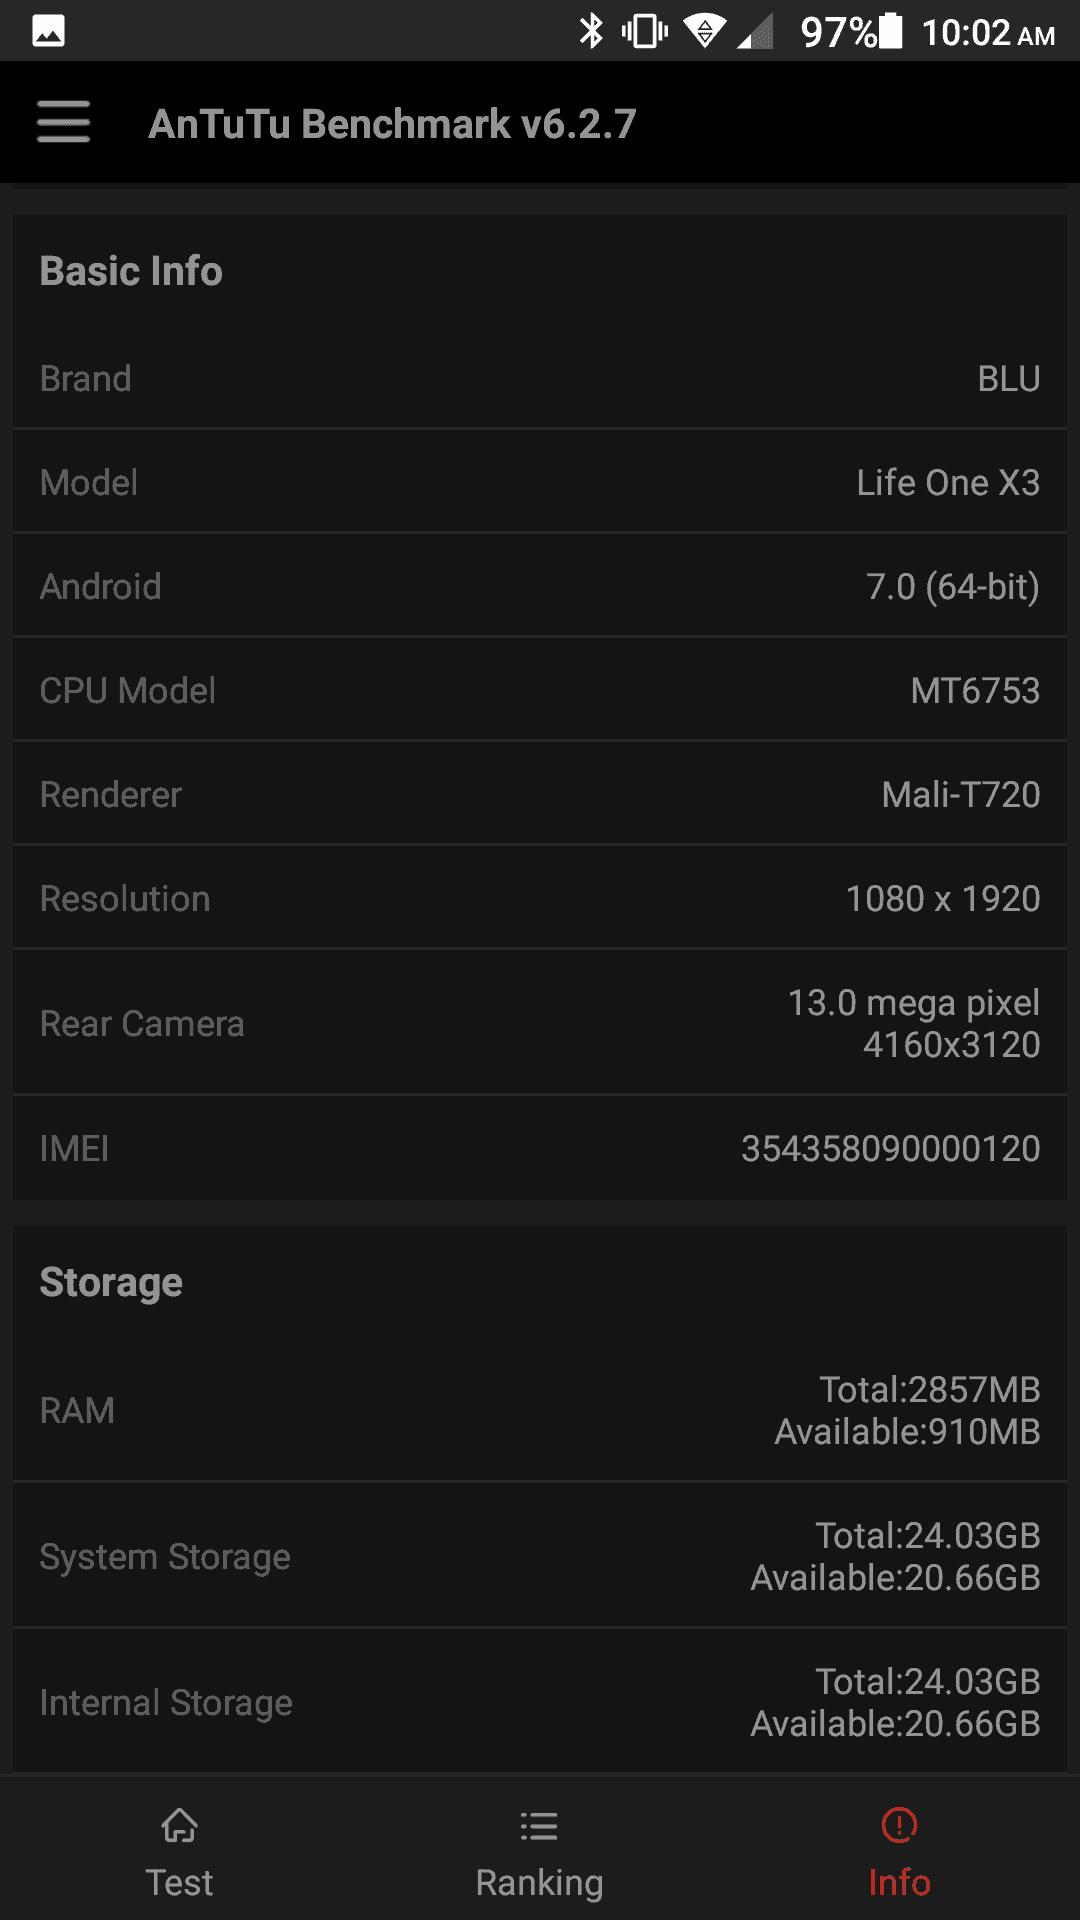 Screenshot 20171202 100232